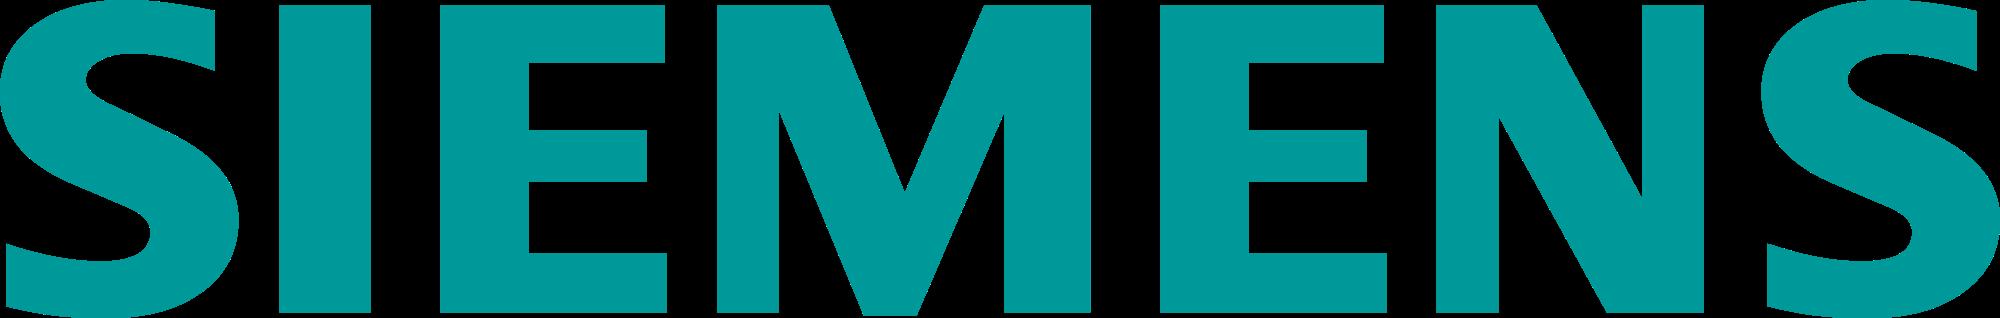 Siemens_AG_logo.svg